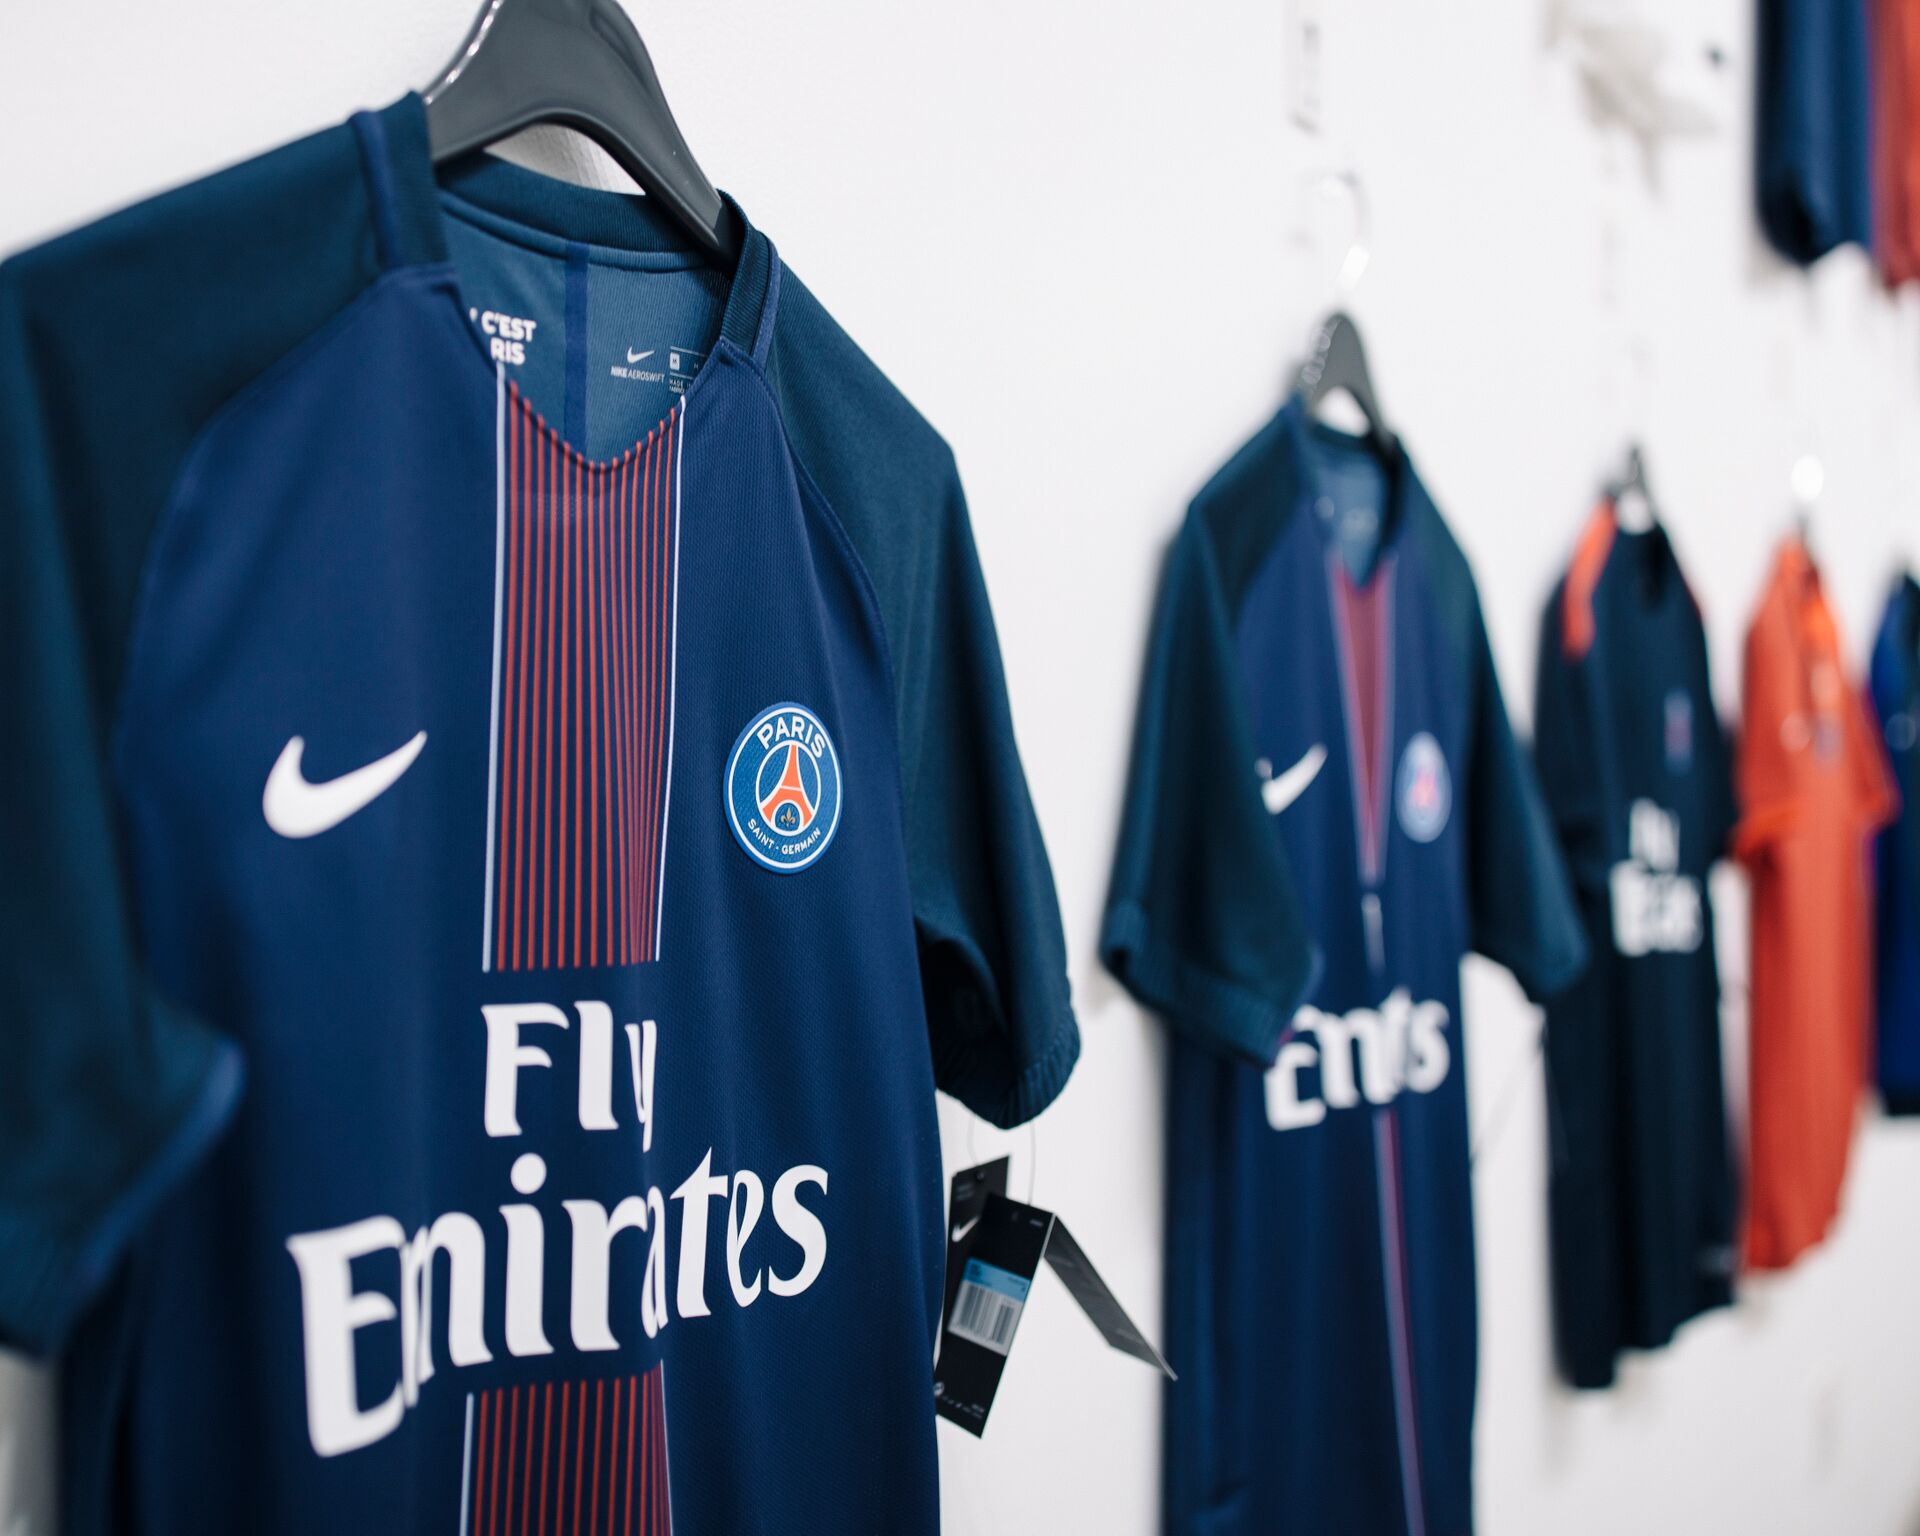 AntonioBrasko-Paris-SaintGermain-LaGalerie-PopUp-TheSeventhLetter-LosAngeles-ArtGallery-Art-Design-Graffiti-SprayPaint-Boombox-Soccer-Futbol-PSG 23.jpg